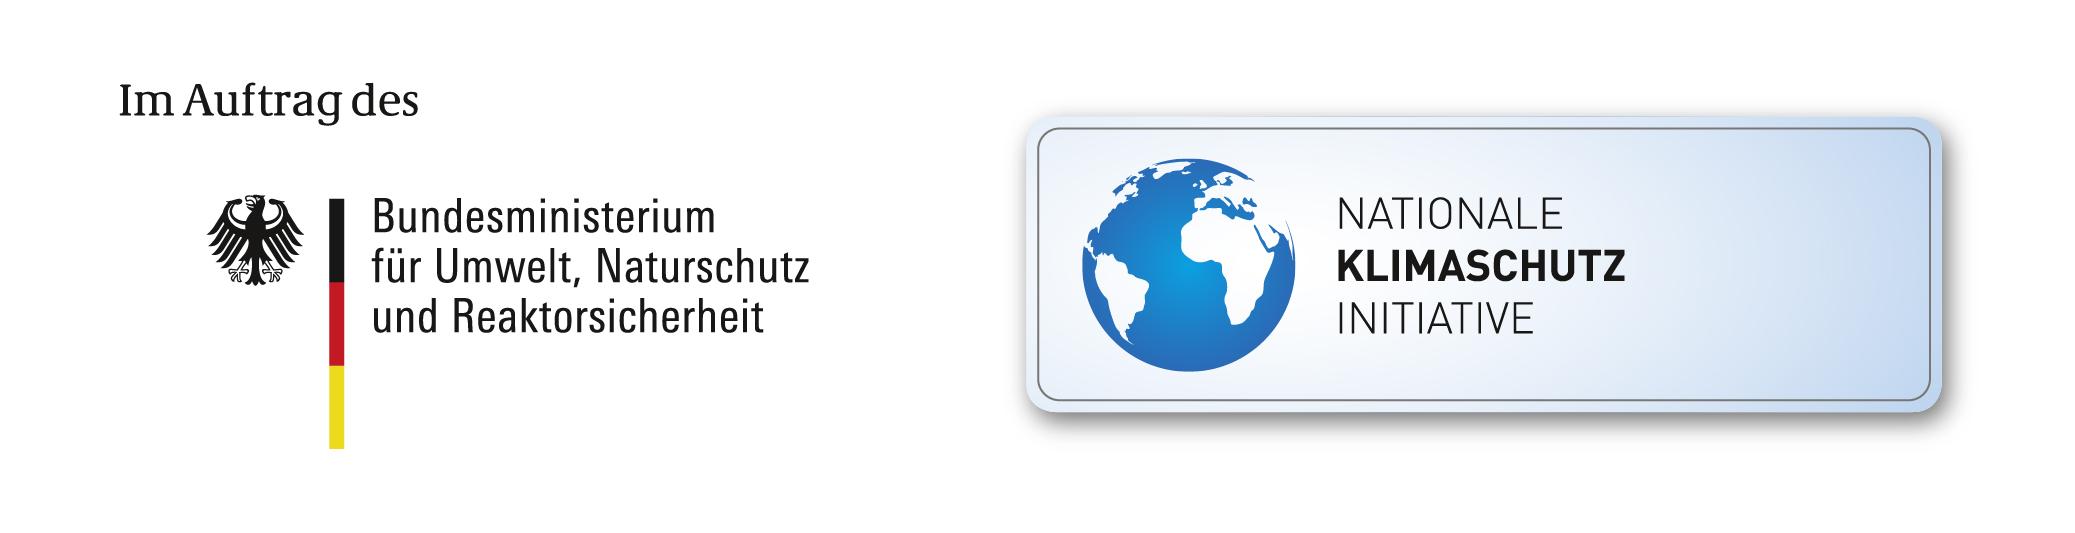 BMU NKI auftrag Web 300dpi de quer